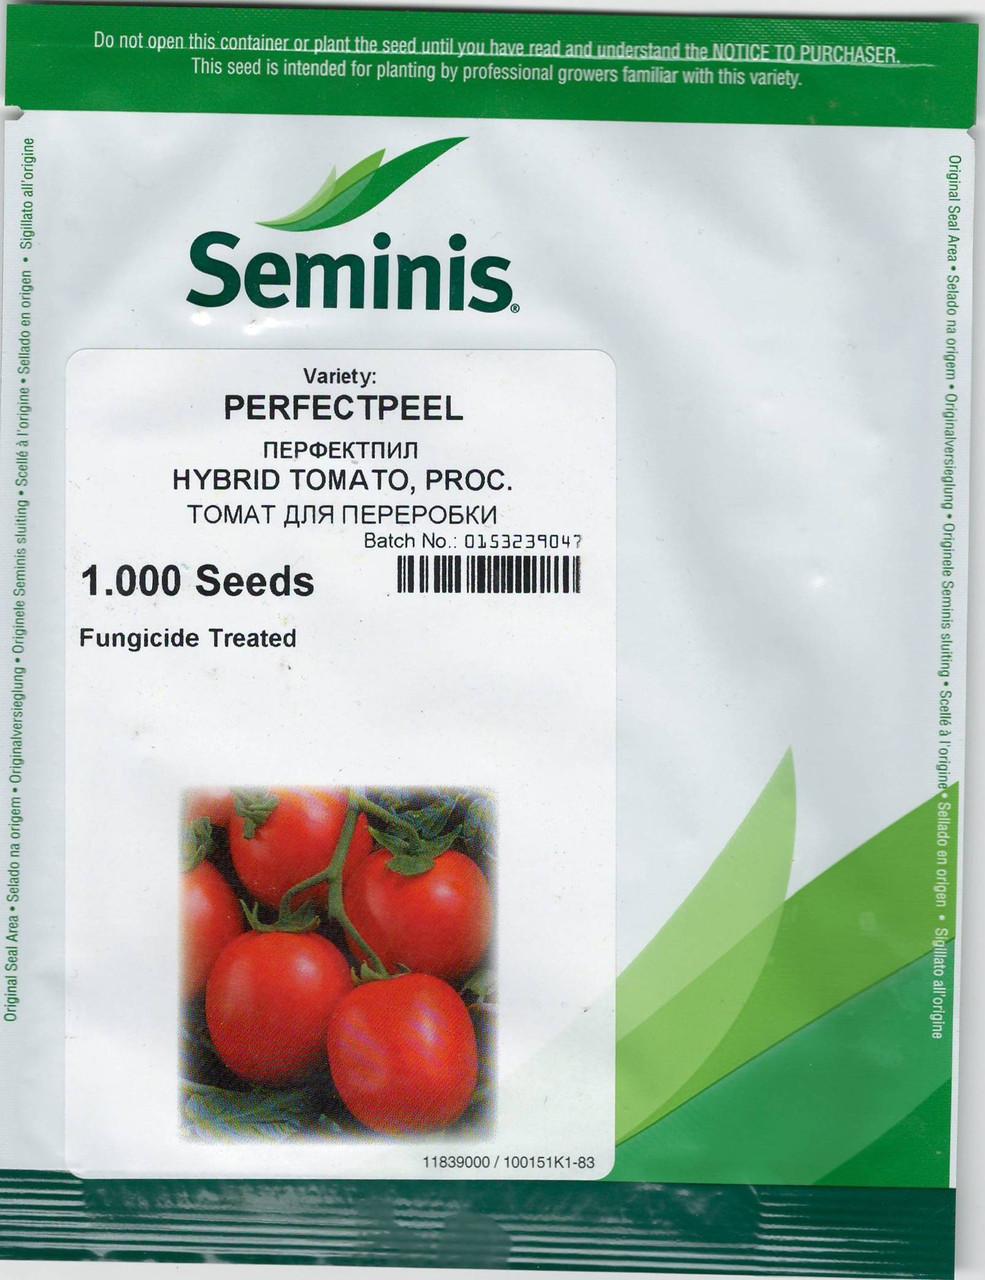 ПЕРФЕКТПИЛ F1 / PERFECTPEEL F1 - томат Seminis 1000 семян, фото 1